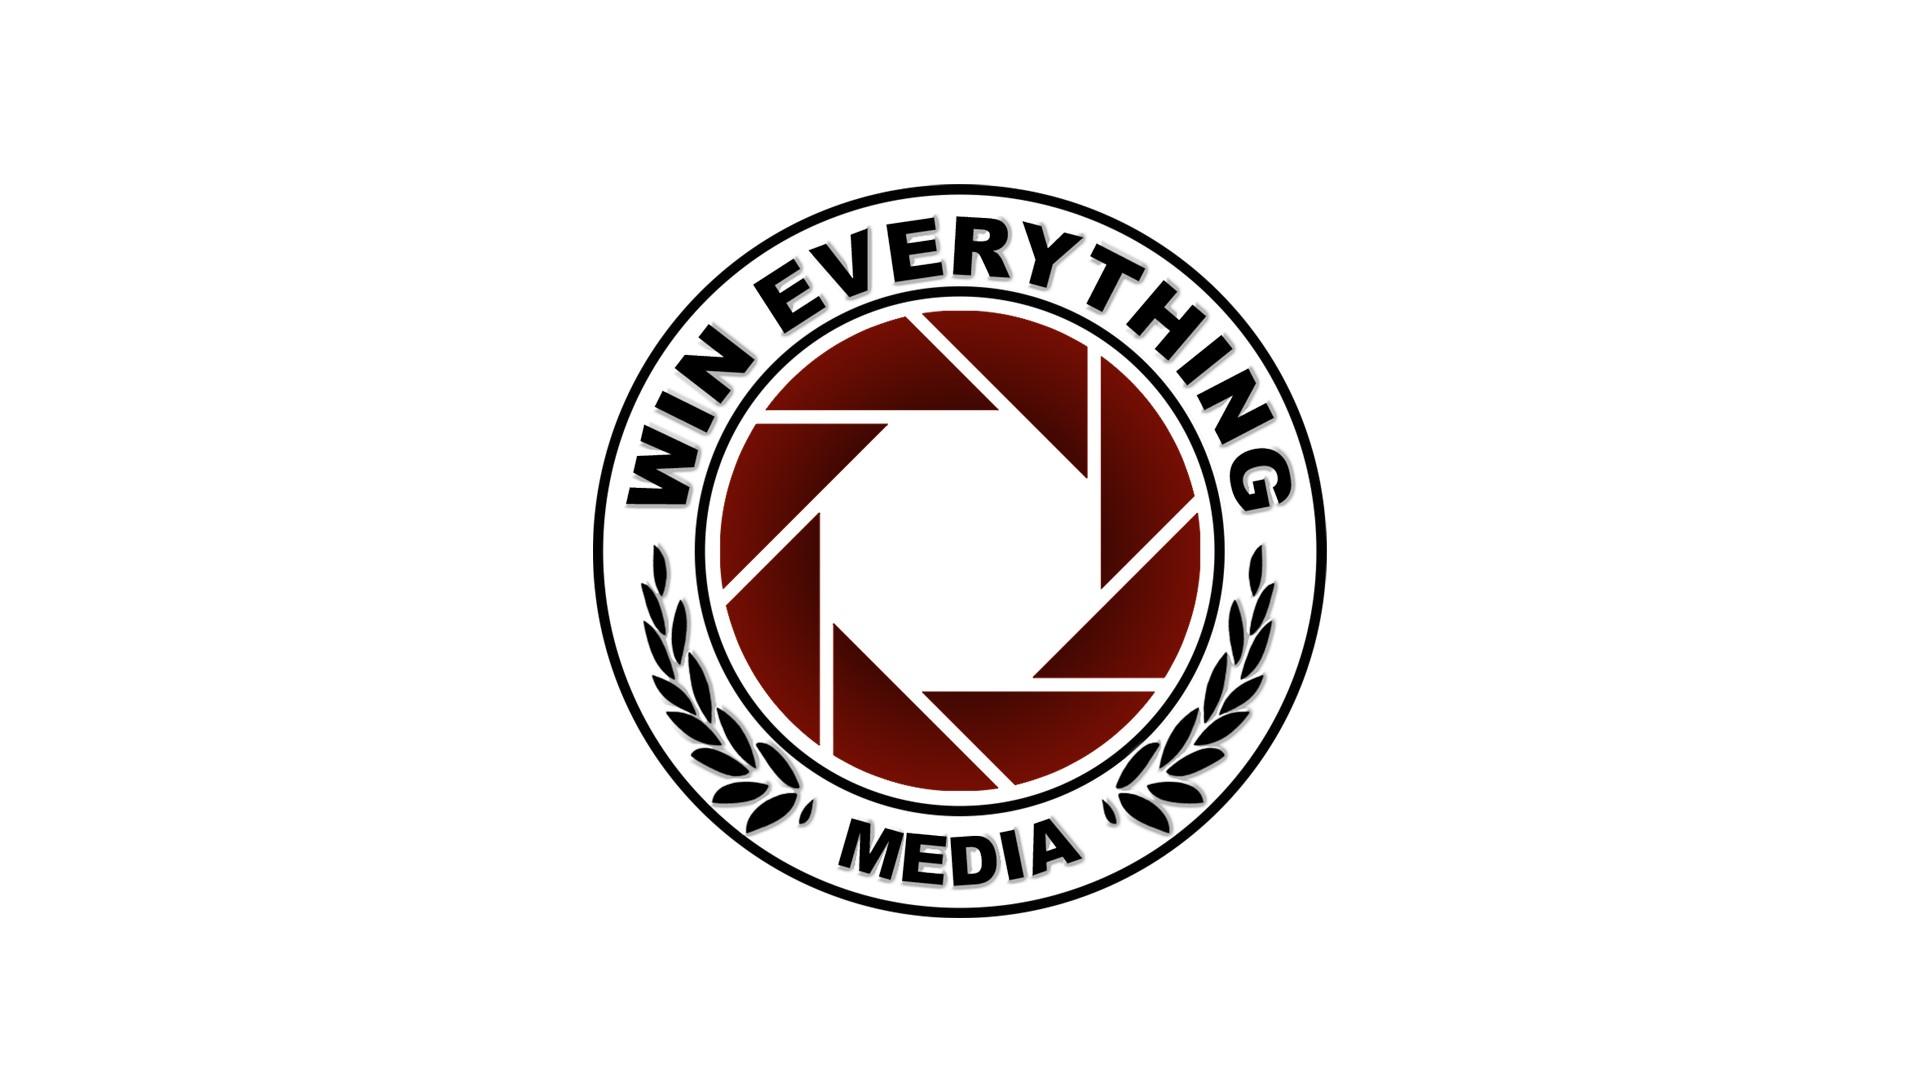 Win everything media logo.jpg